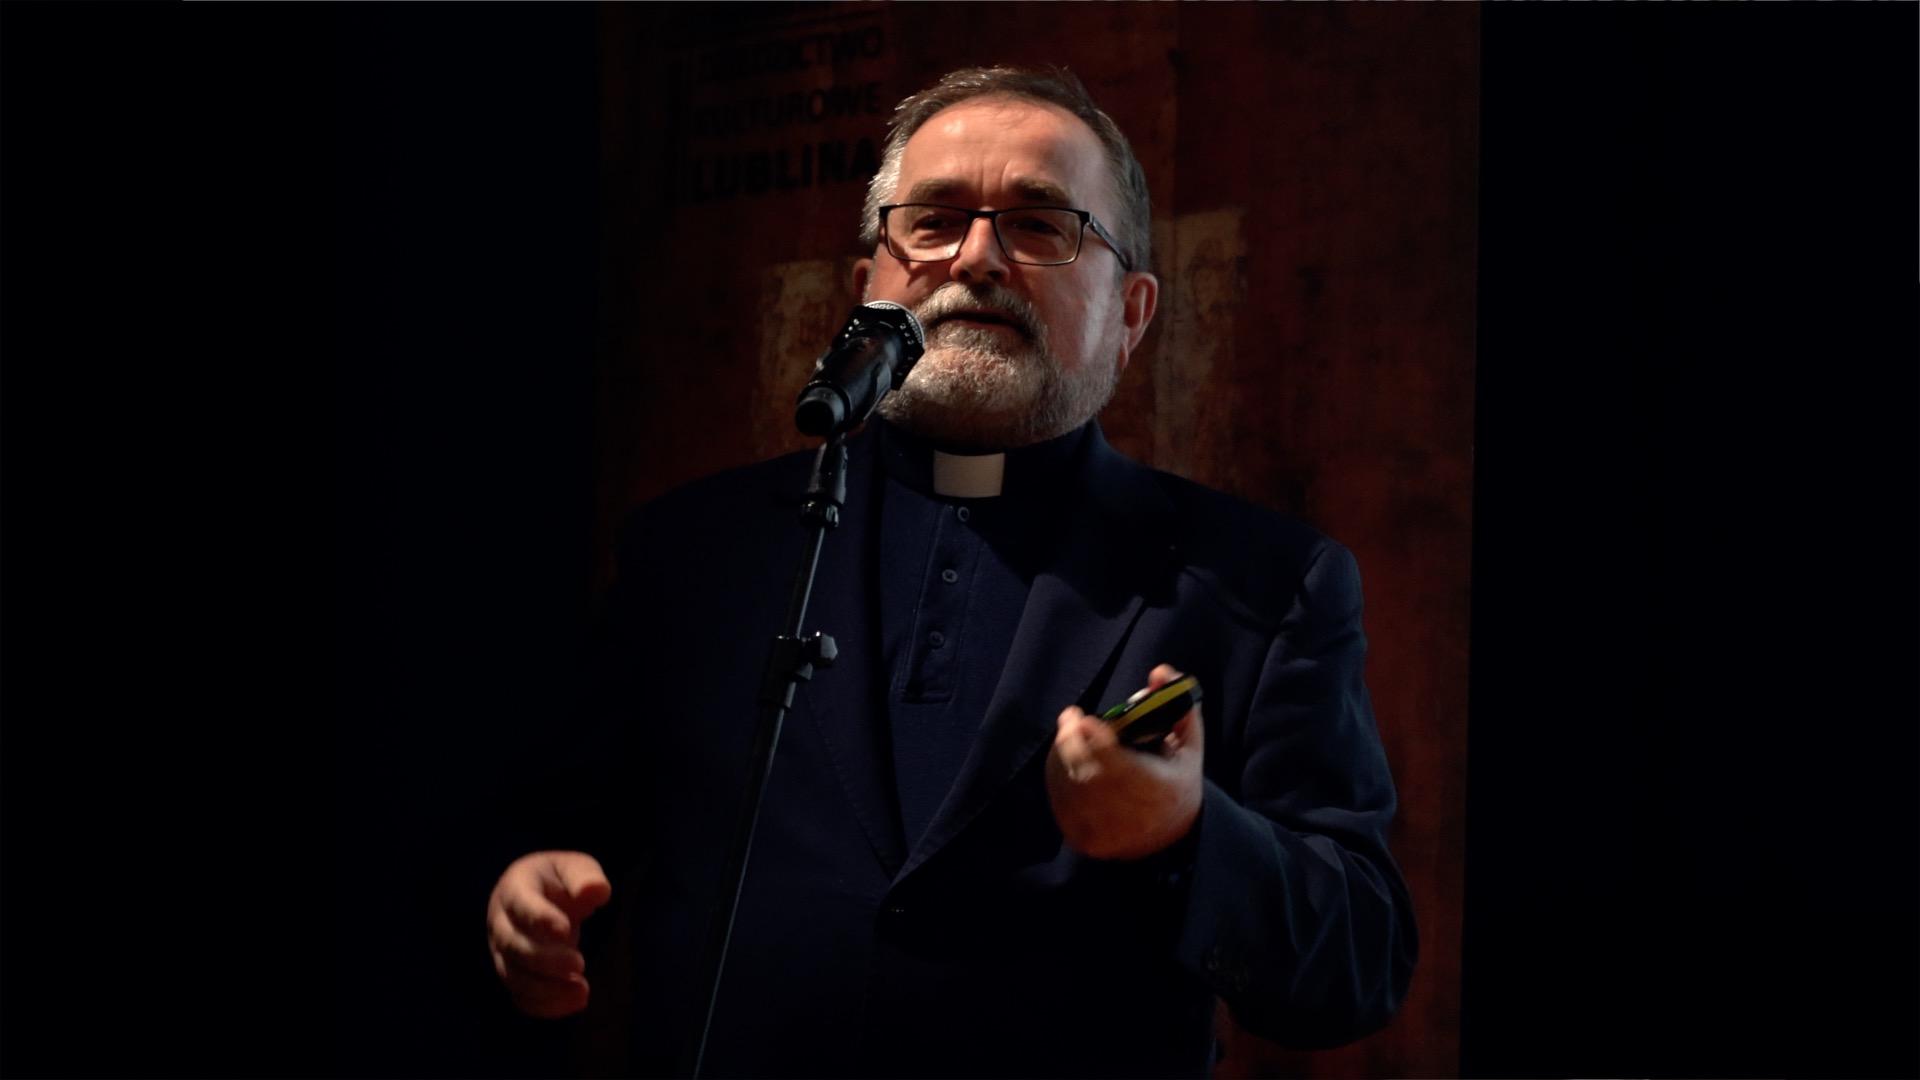 Ks. prof. dr hab. Andrzej Pietrzak SVD